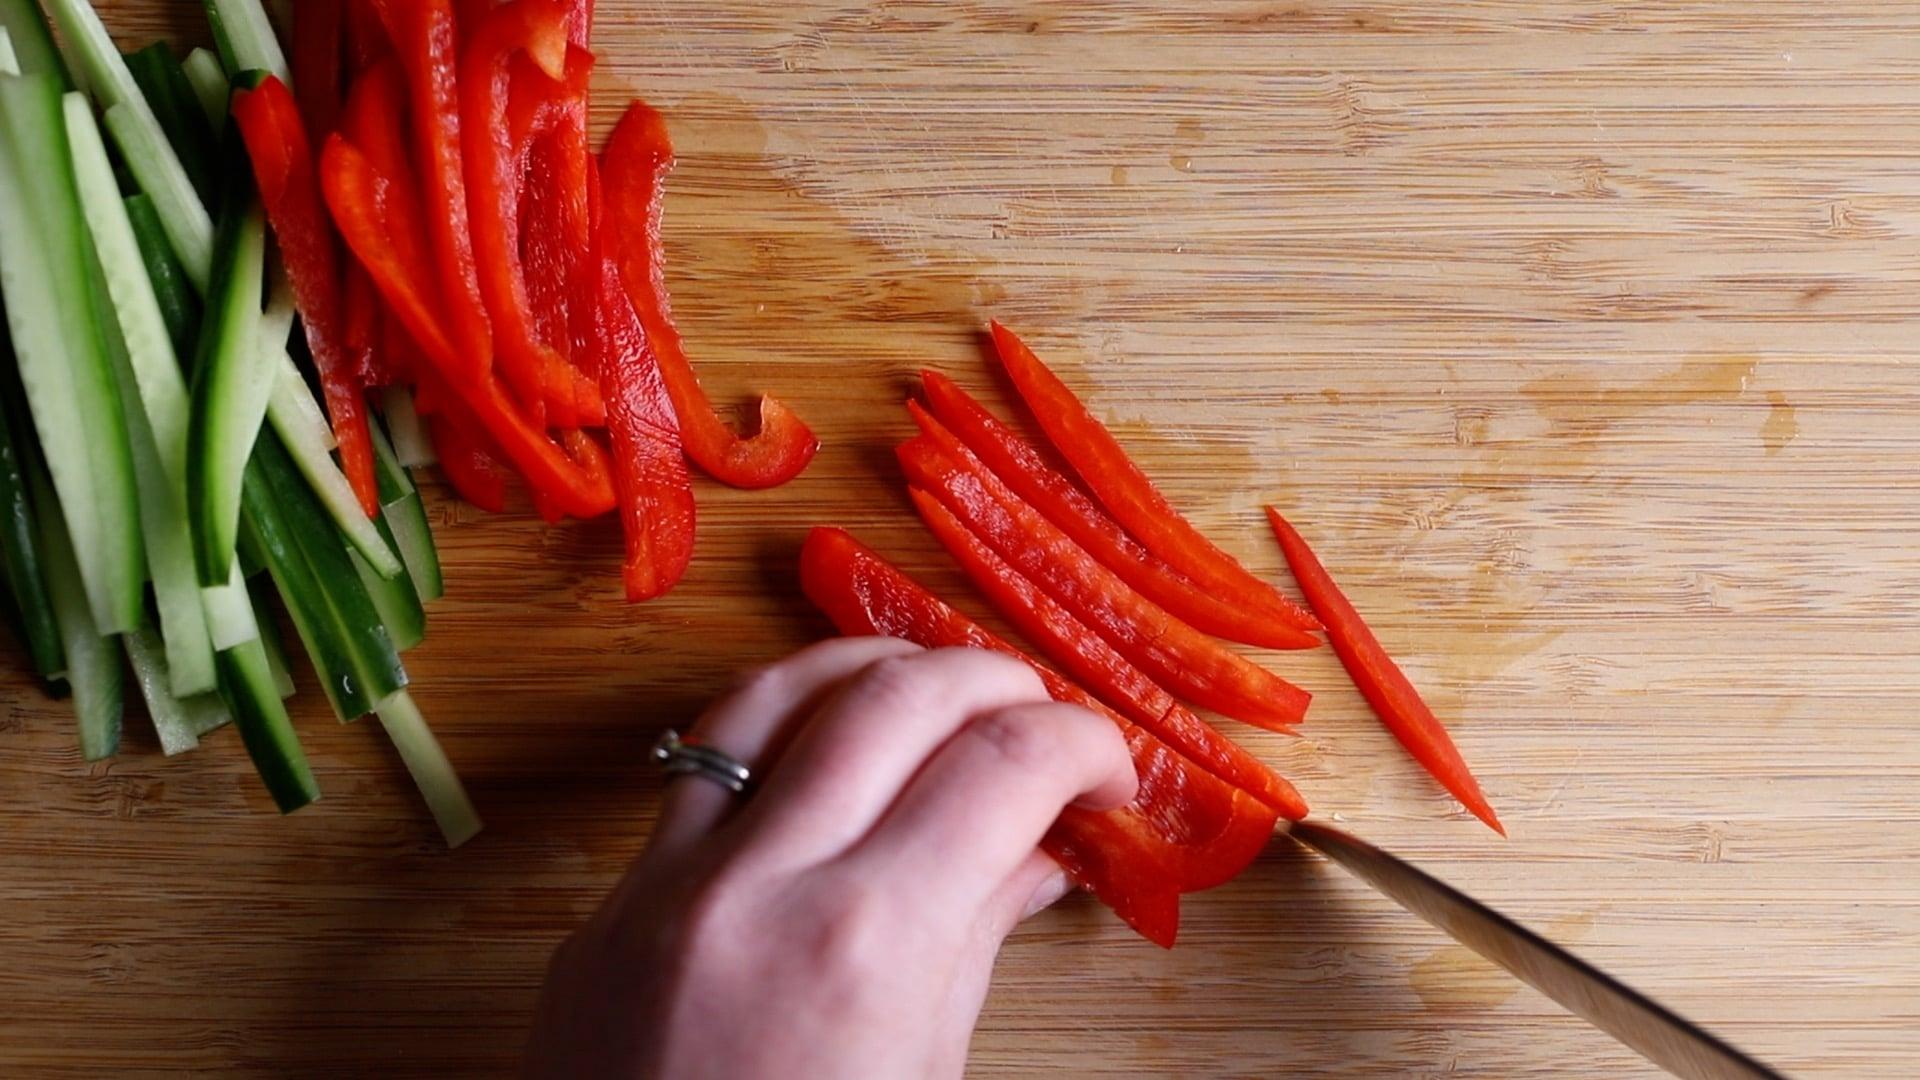 Slice vegetables into thin julienne sticks